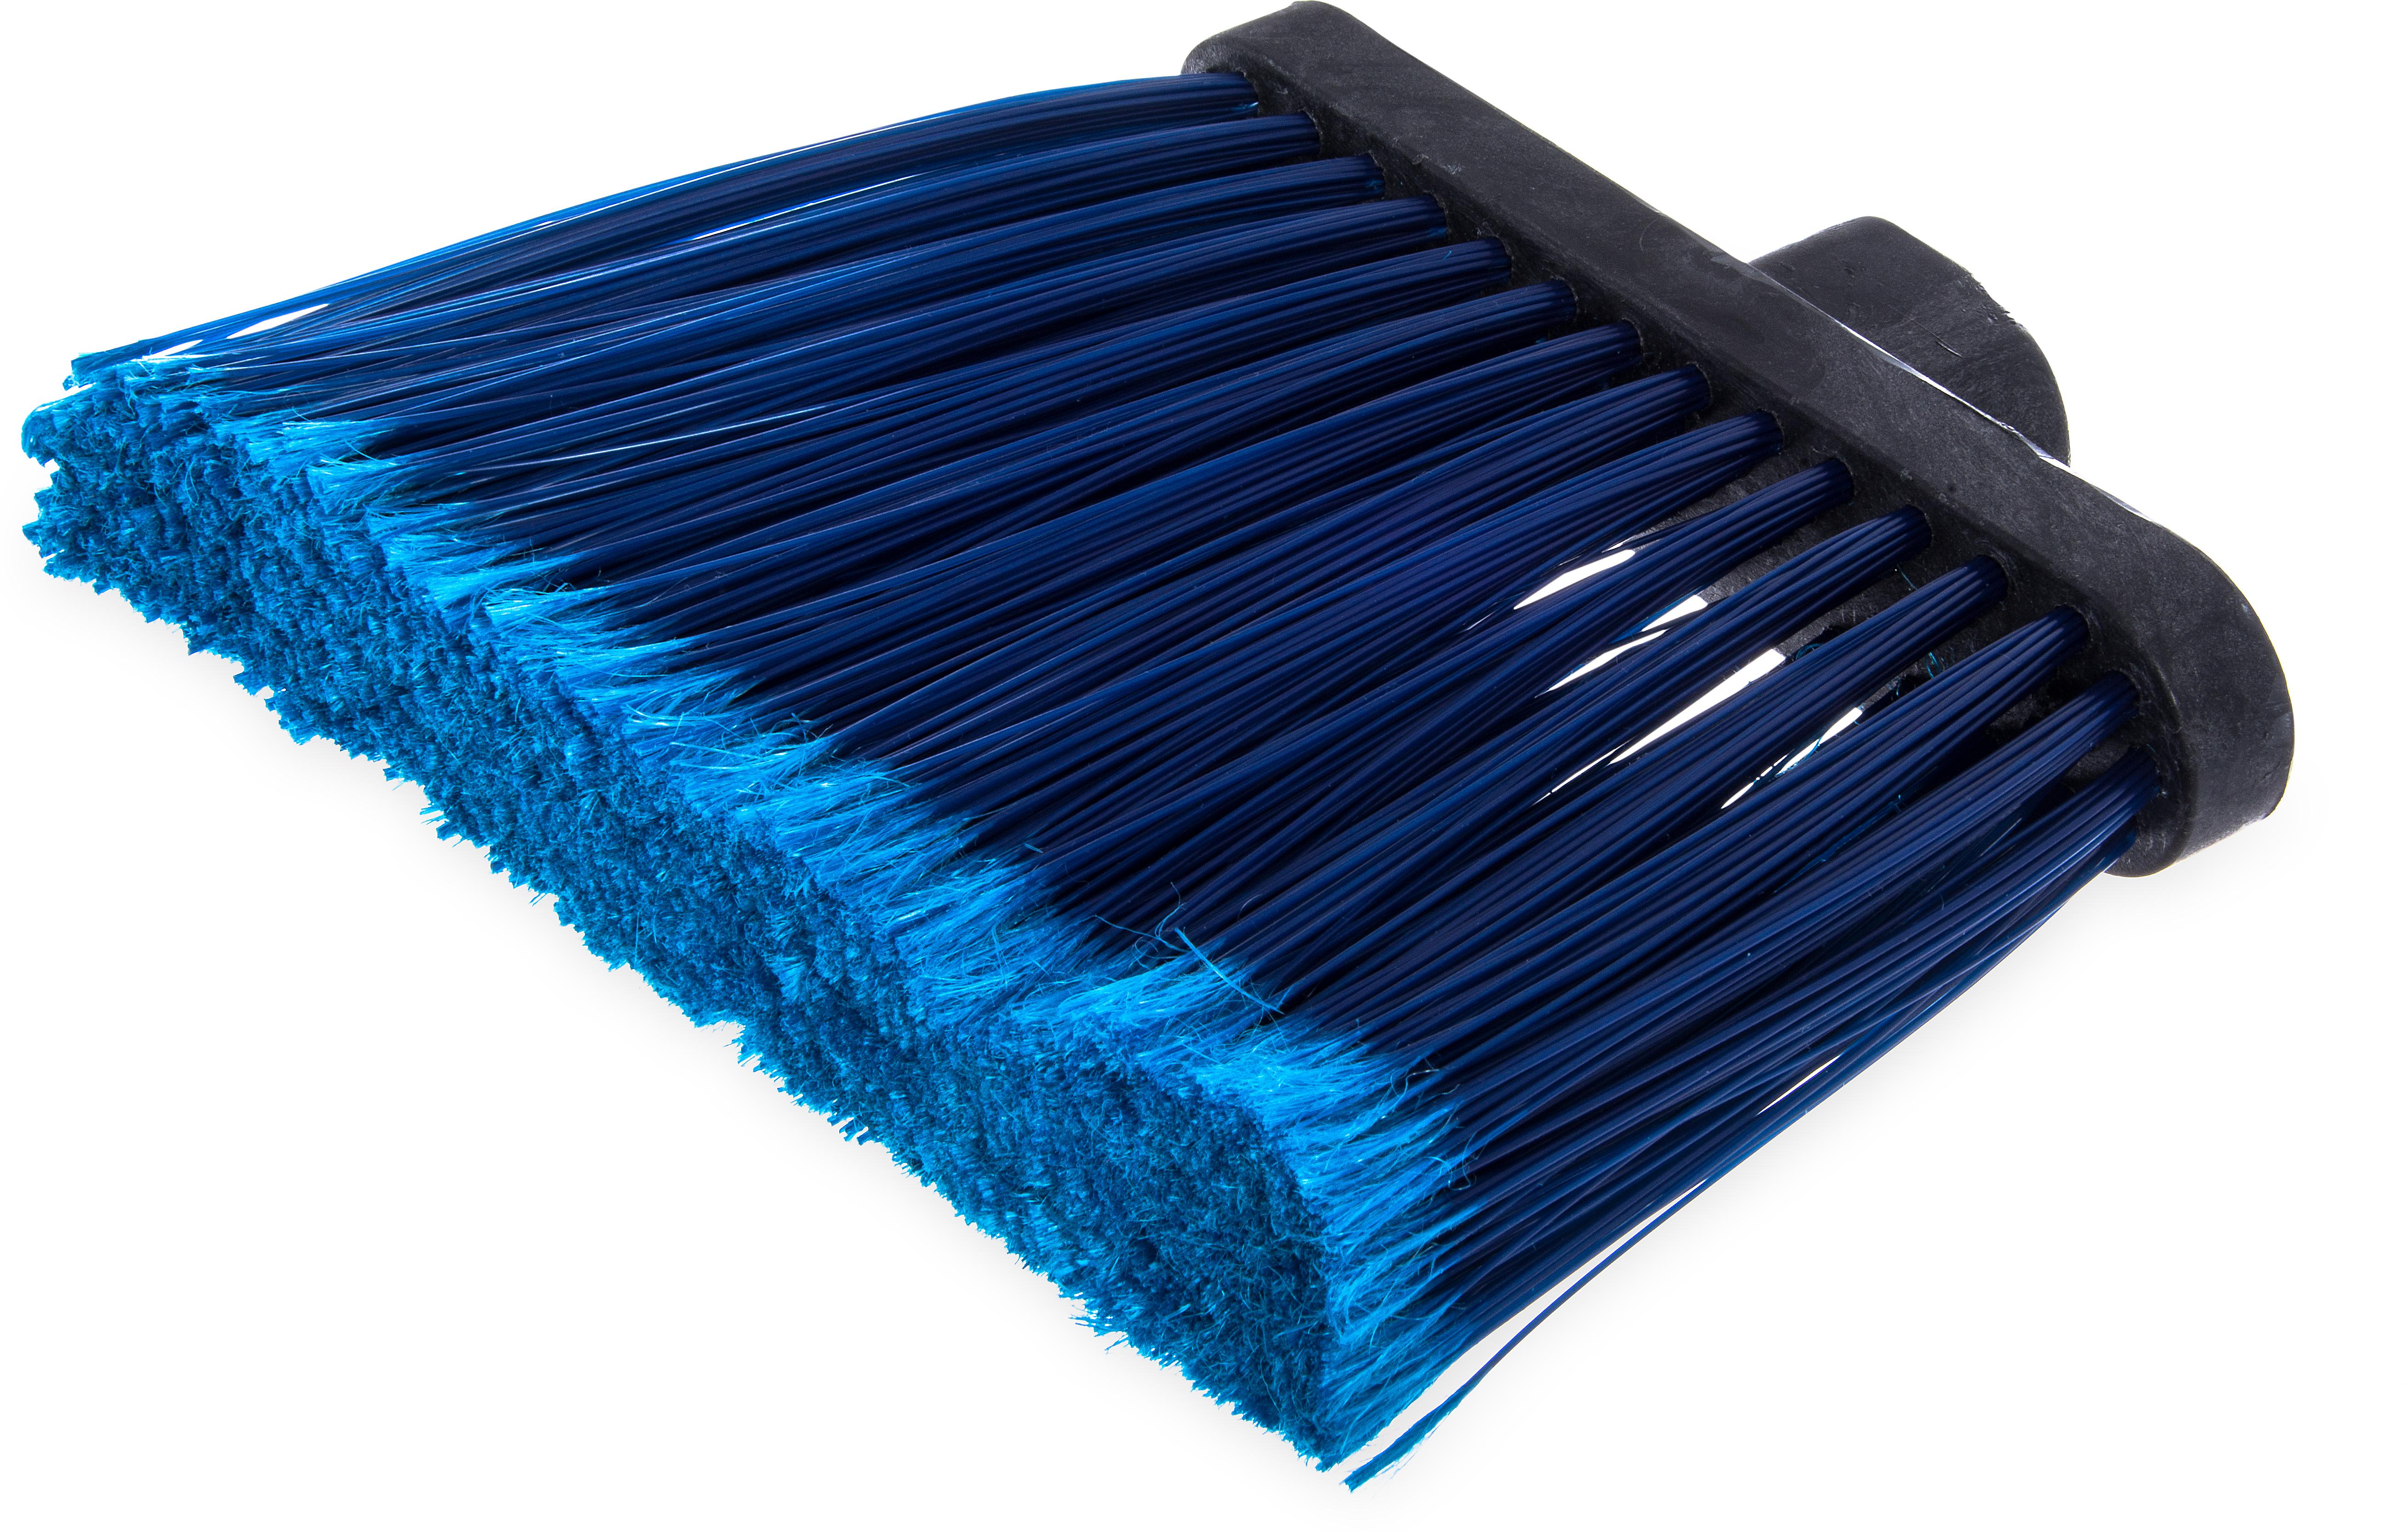 Carlisle 3686714 duo-sweep angle brooms